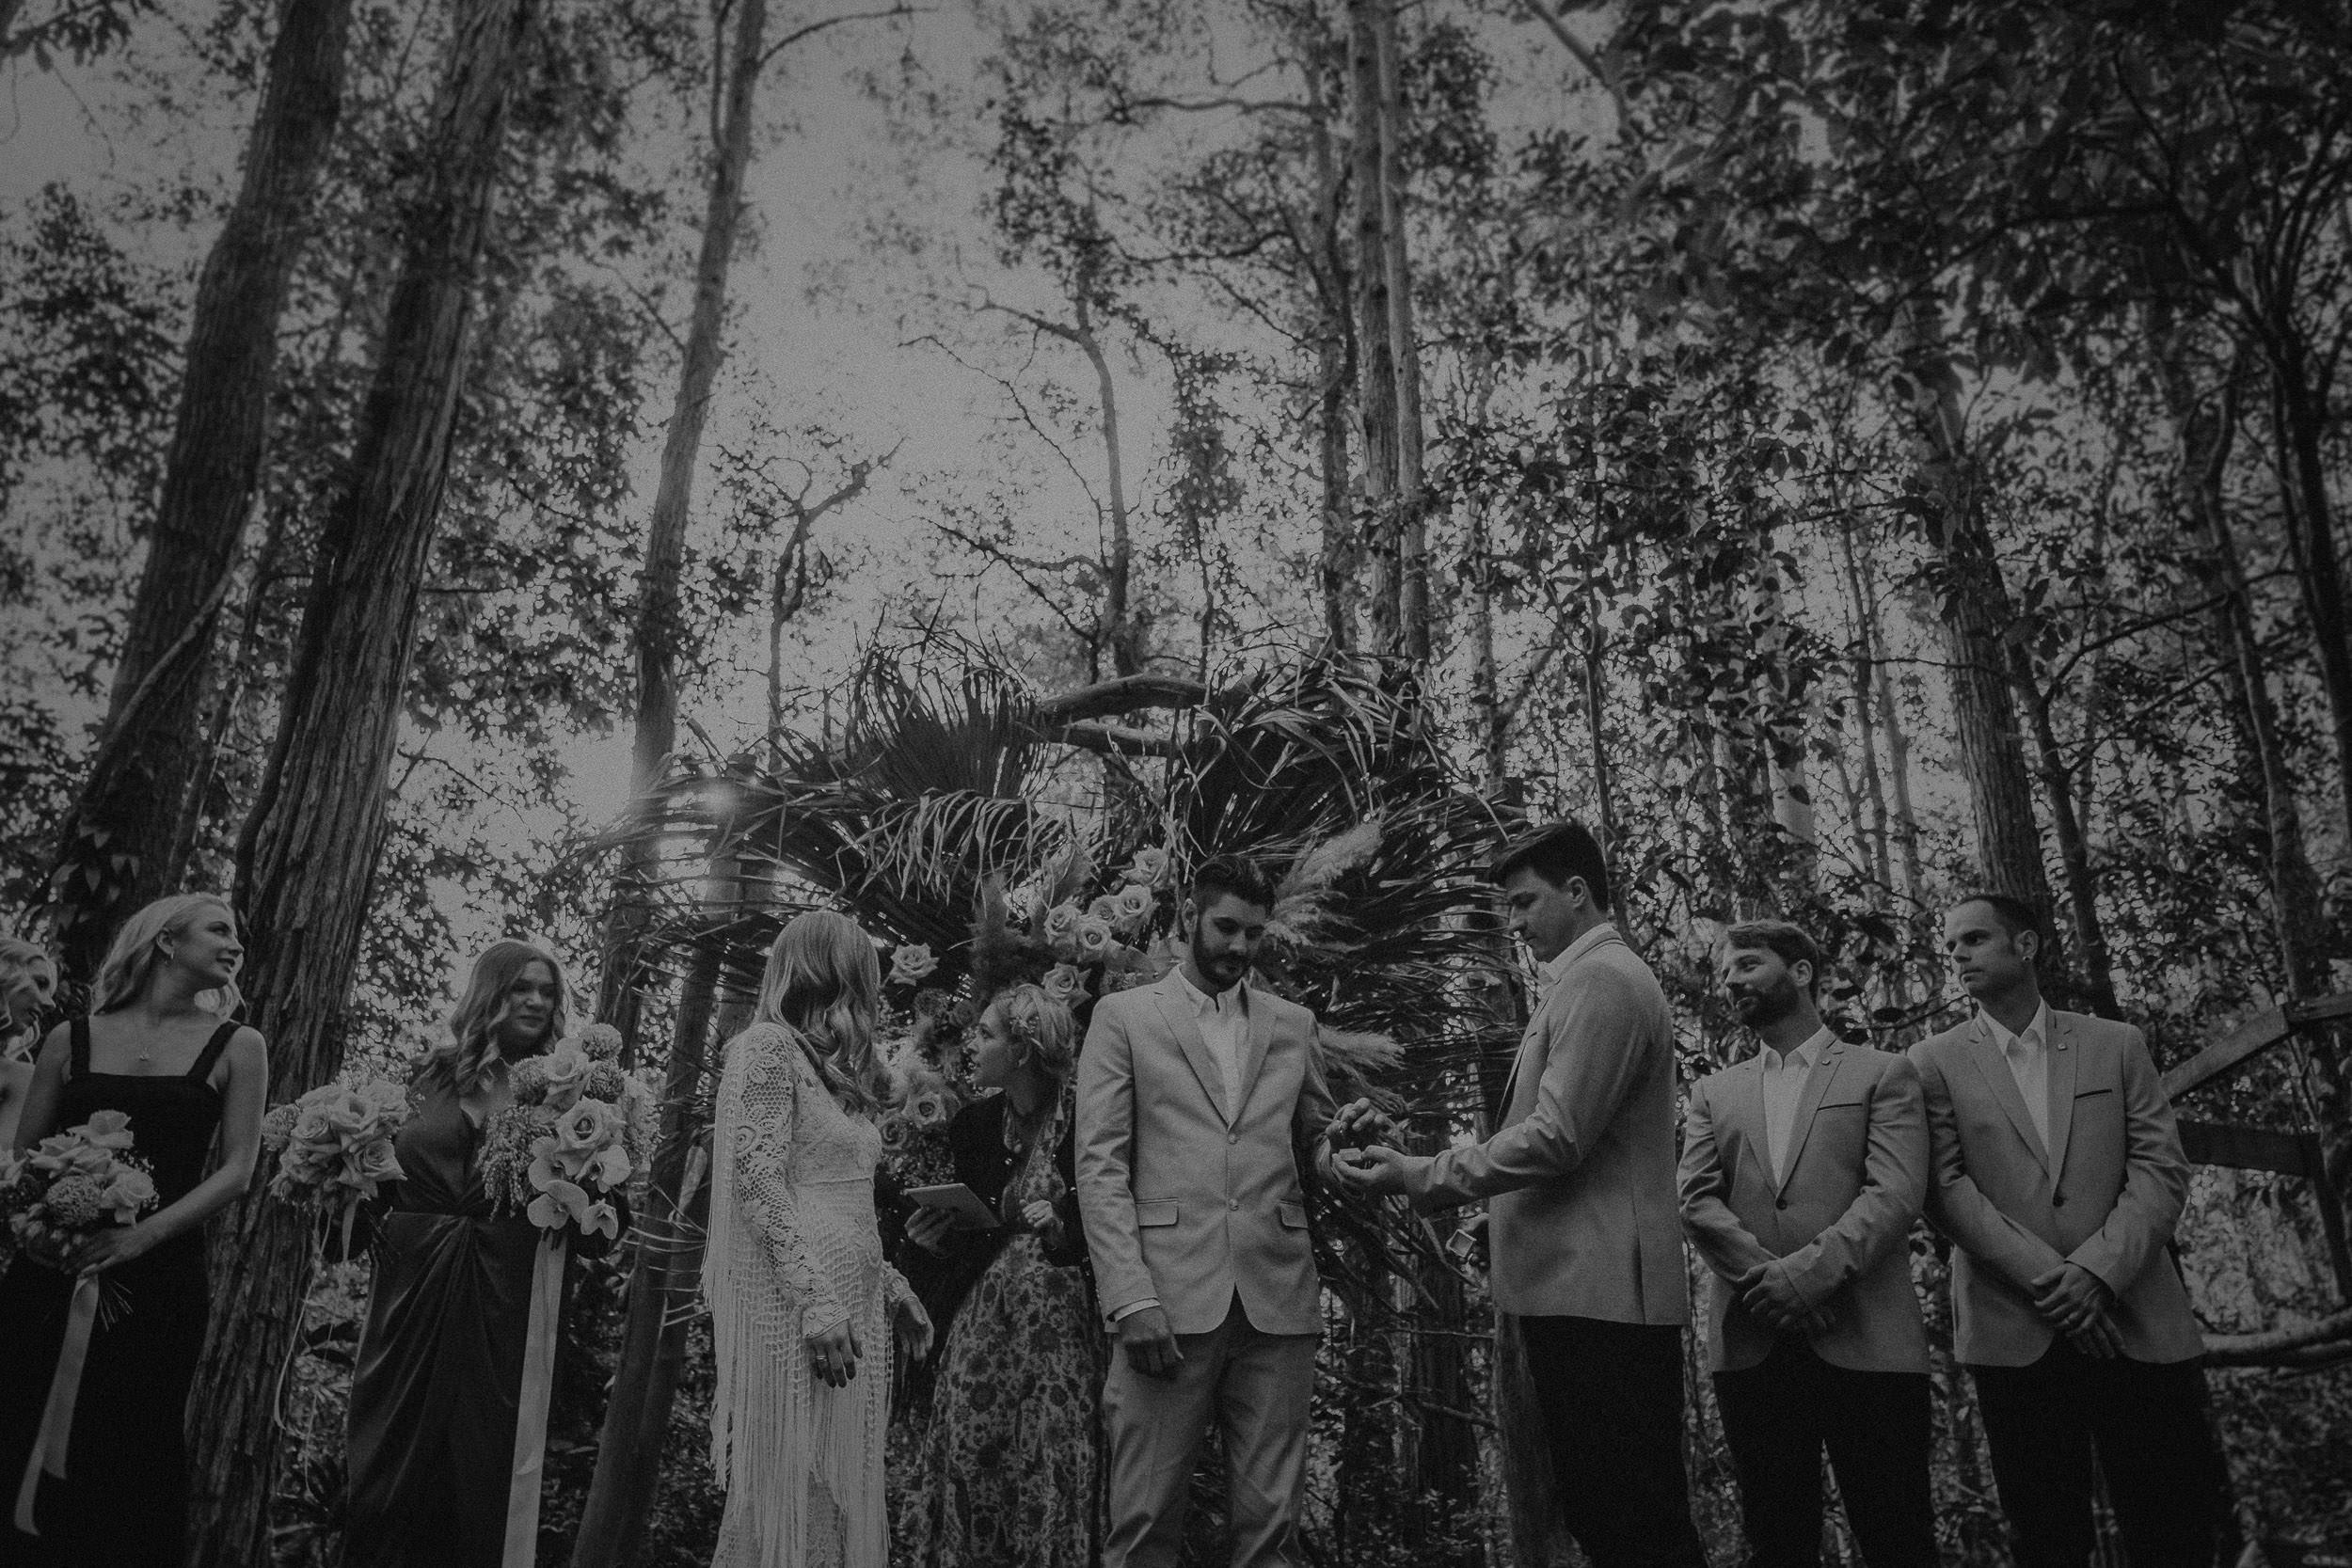 S&A Elopement - Kings & Thieves - Shred 'Til Dead - Central Coast Beach Forest Wedding - 208.jpg